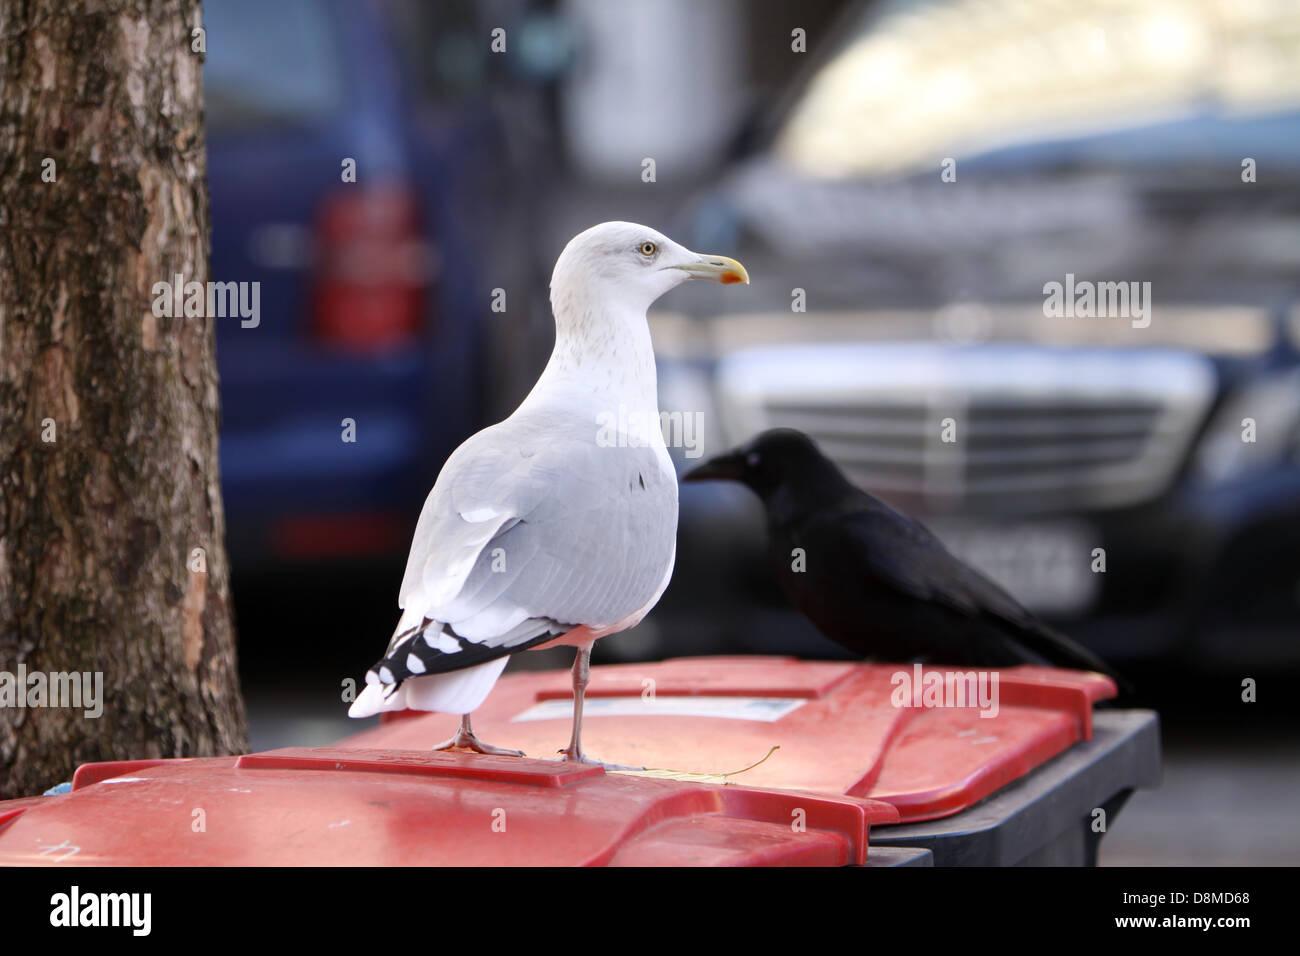 seagull on a dustbin Stock Photo